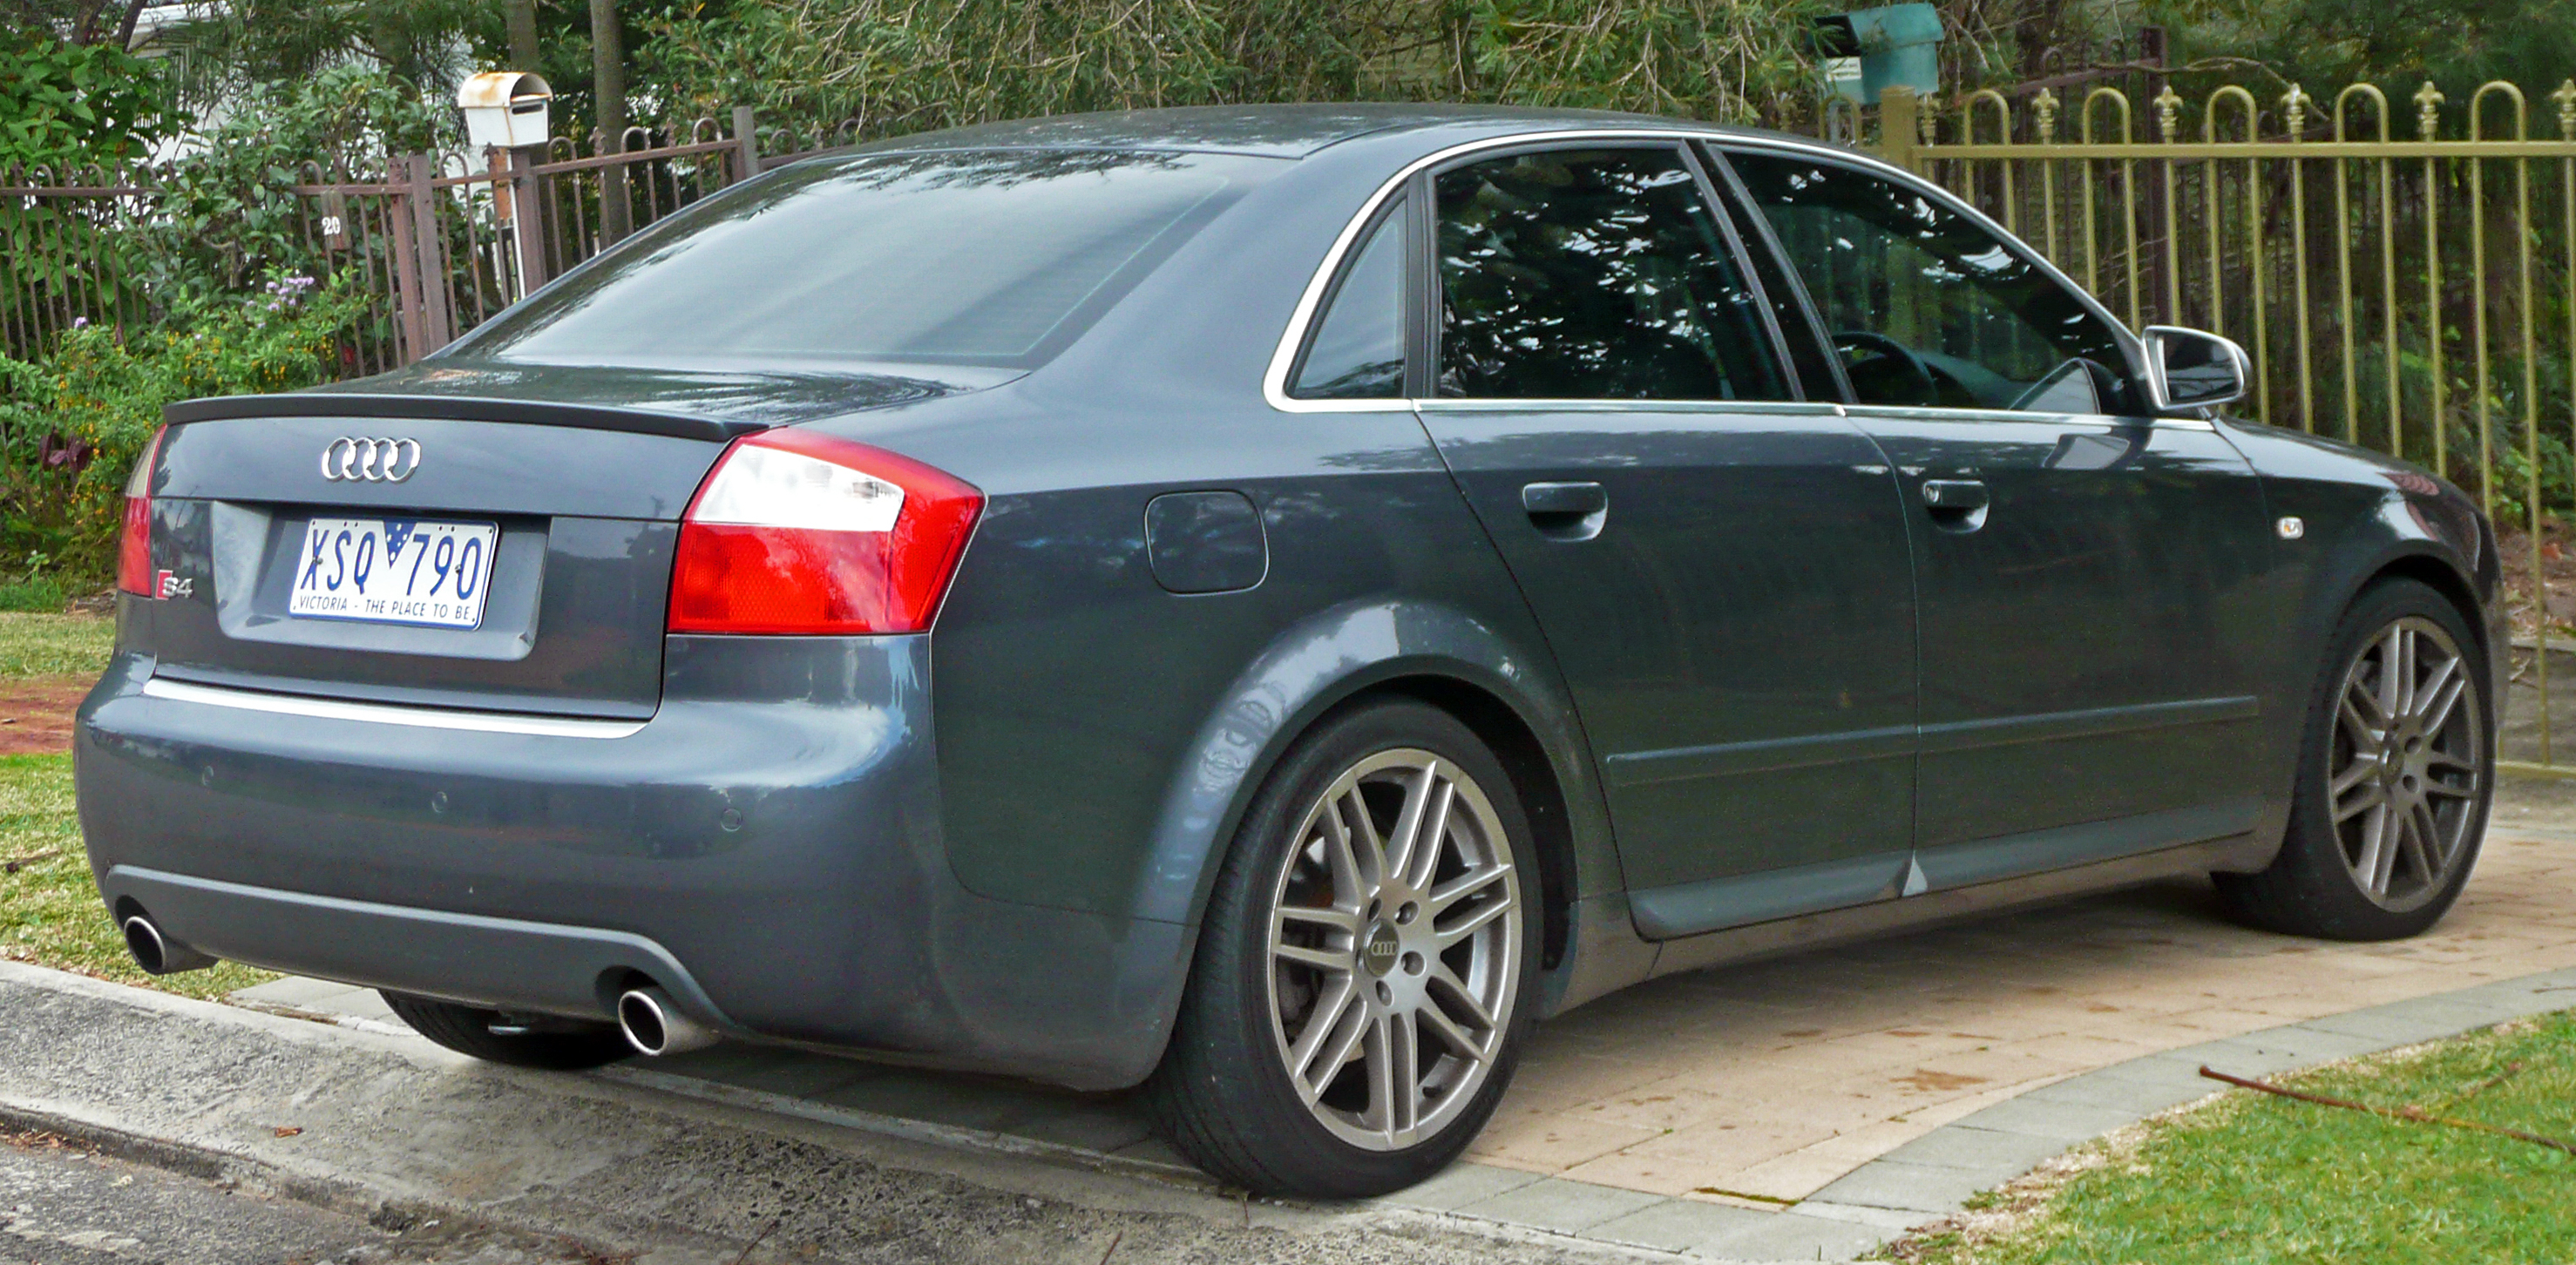 File:2003-2005 Audi S4 (B6) sedan 02.jpg - Wikimedia Commons